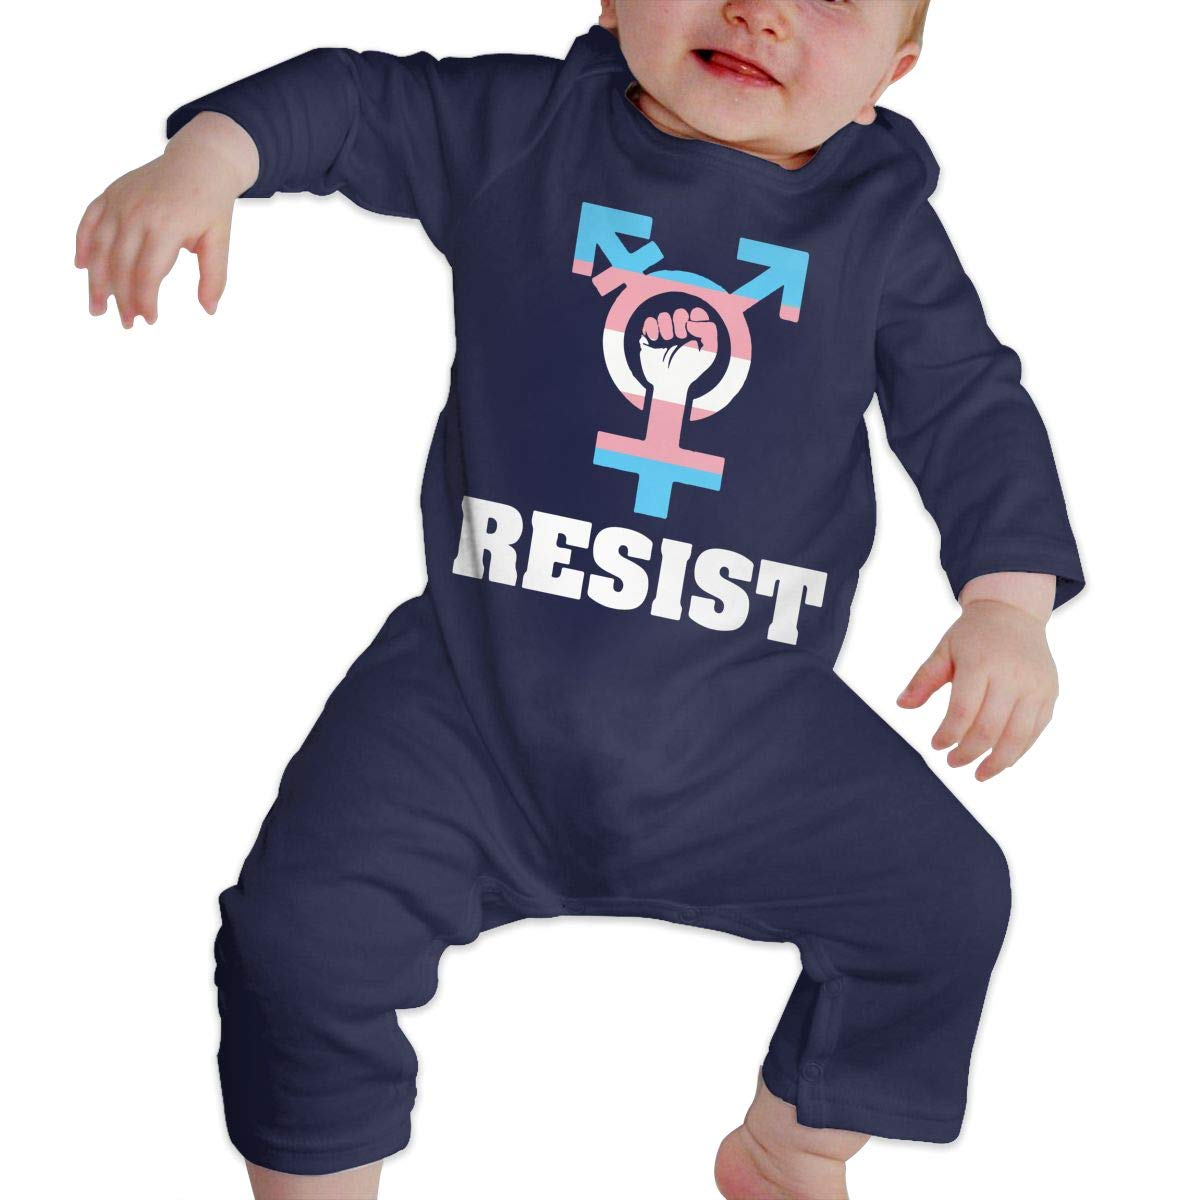 Mri-le1 Newborn Kids Organic Coverall Resist with Transgender Symbol Kid Pajamas